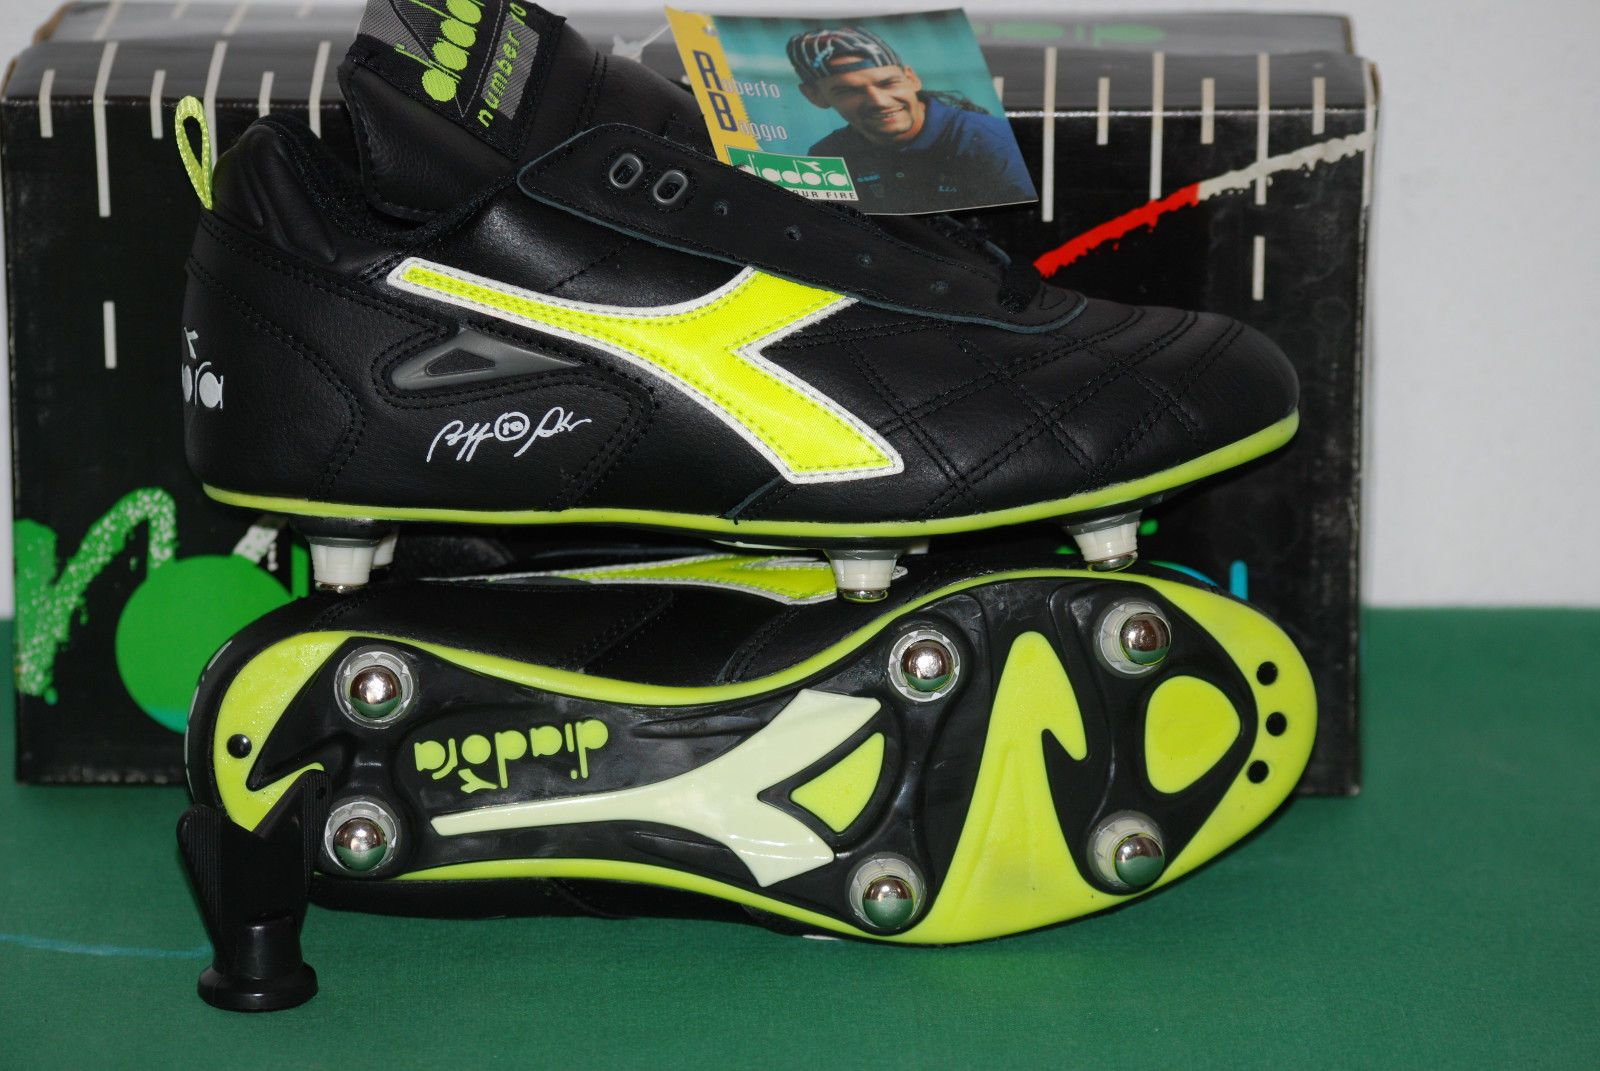 4ac41af6785d vintage diadora roberto baggio club pro NUMBER 10 SC match worn boots shoes  1990 | eBay